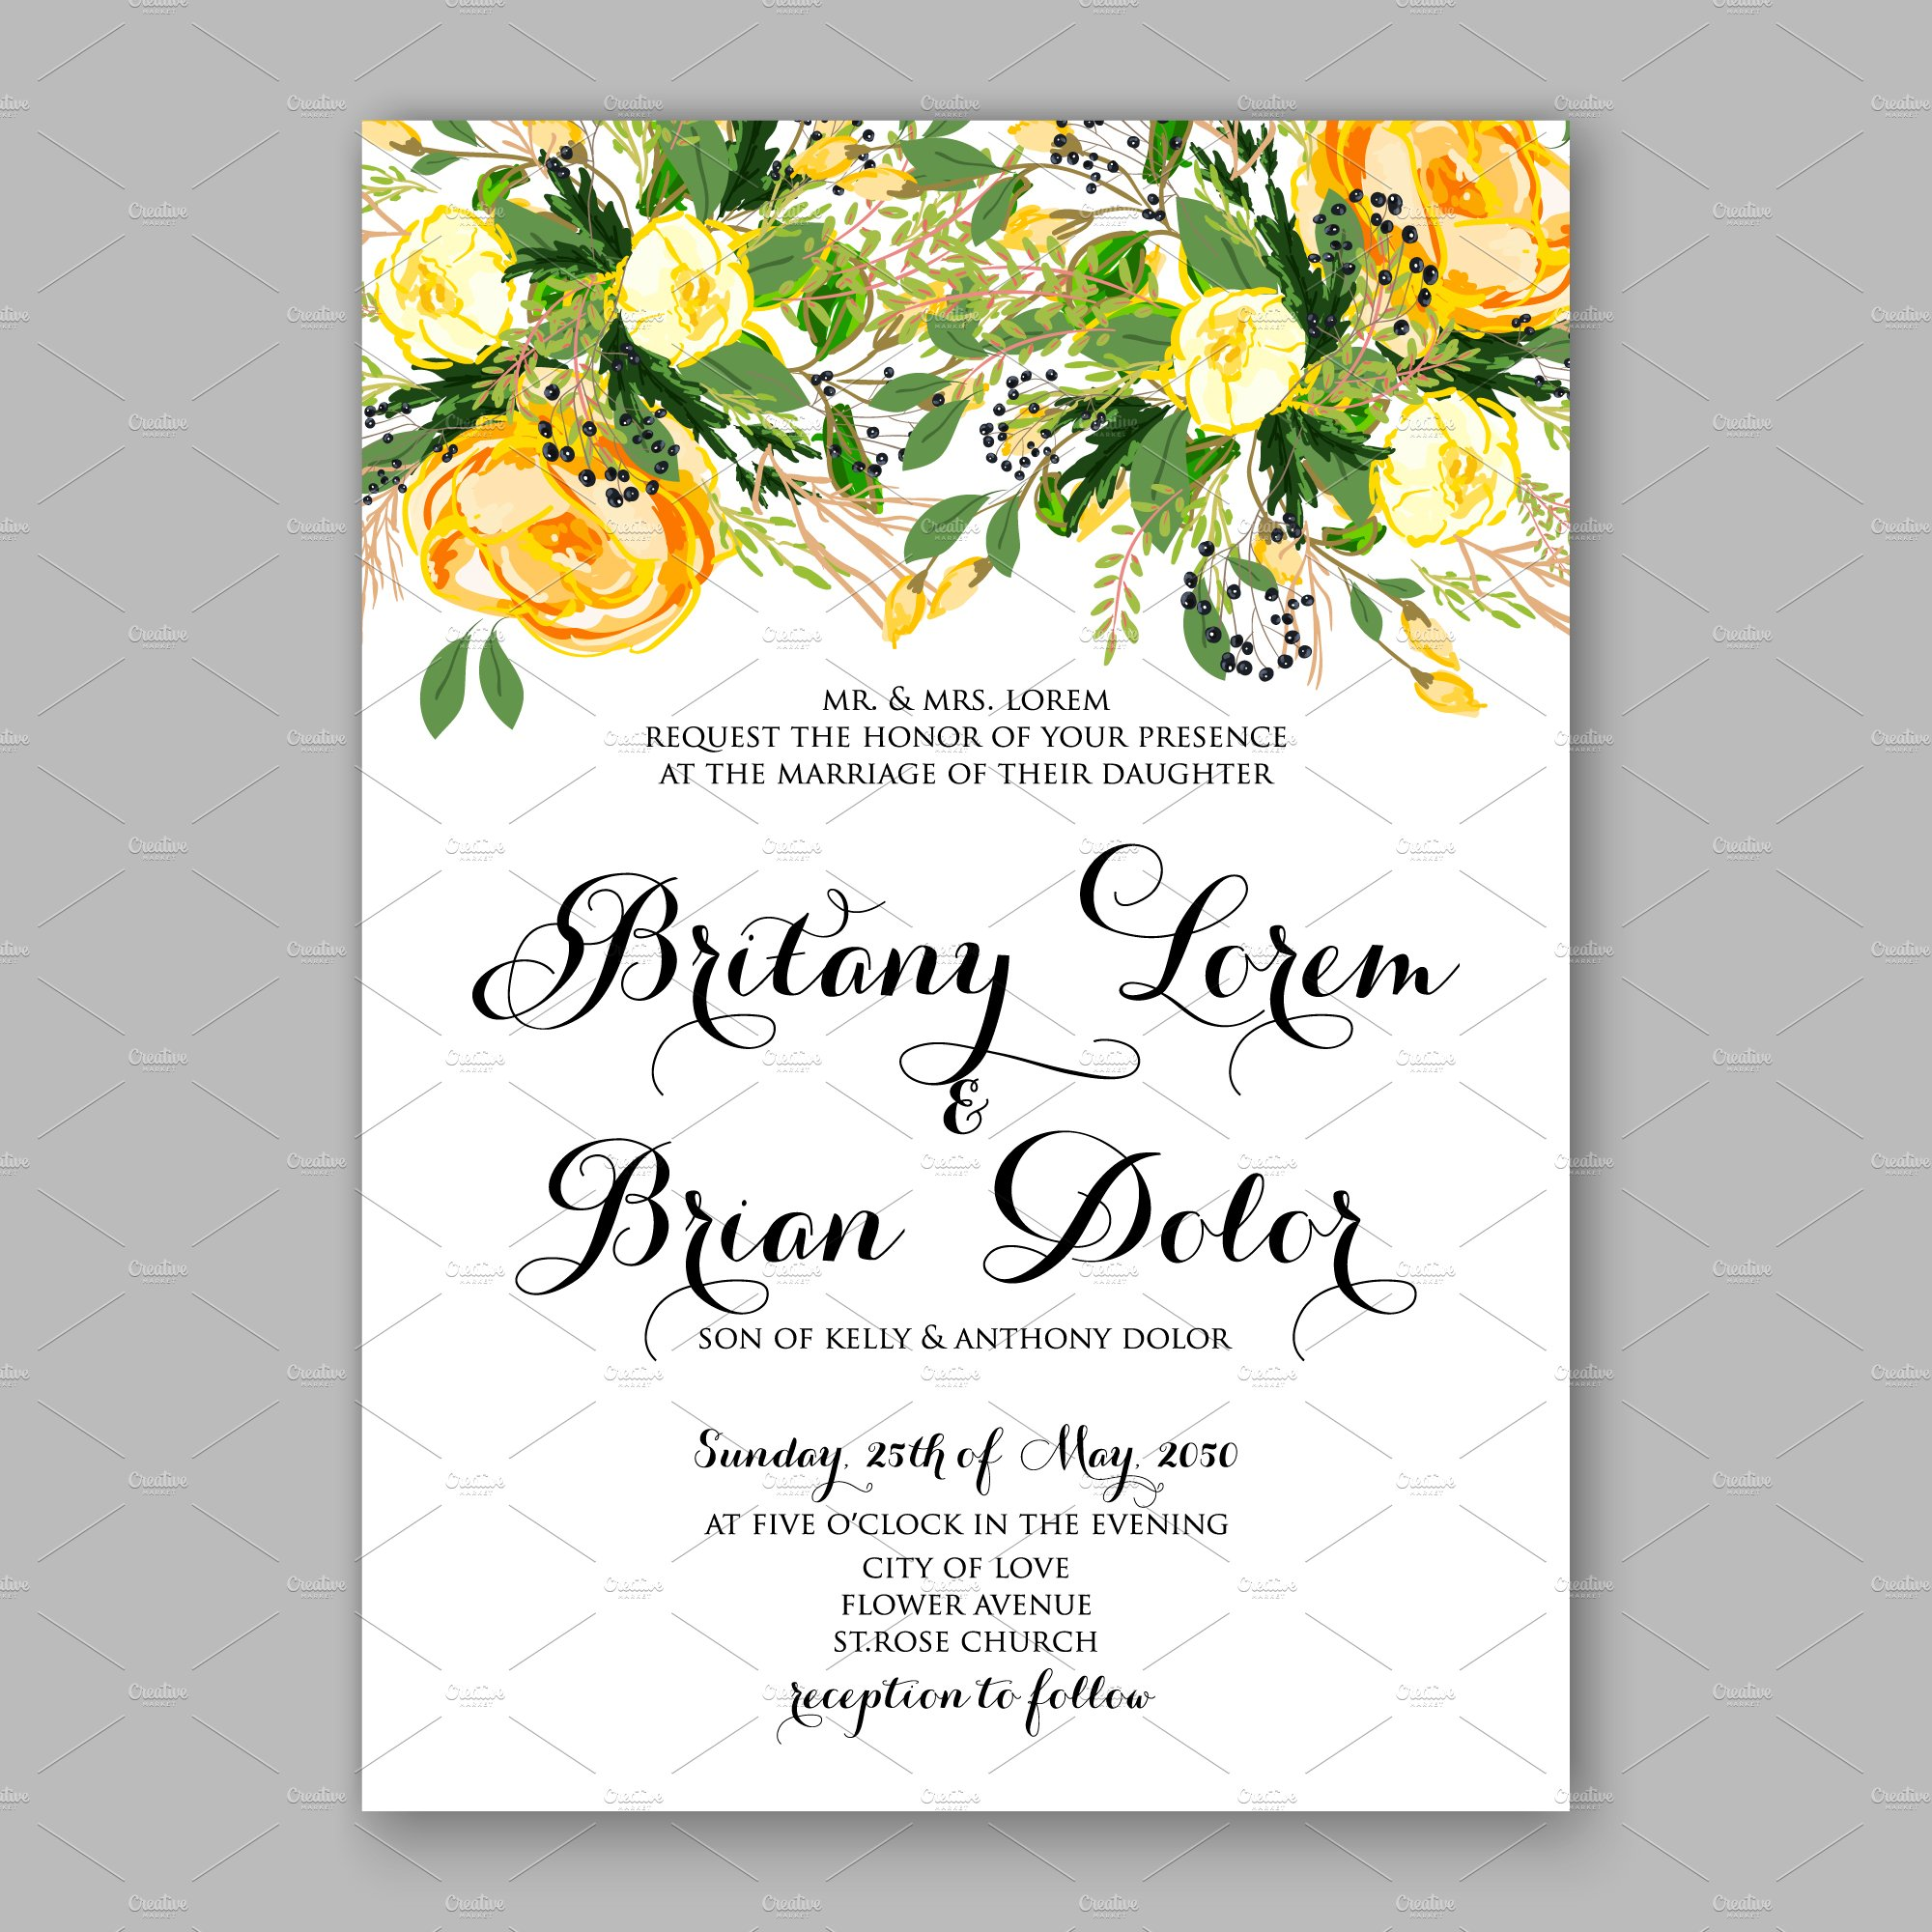 Wedding invitation Yellow rose | Creative Illustrator Templates ~ Creative  Market